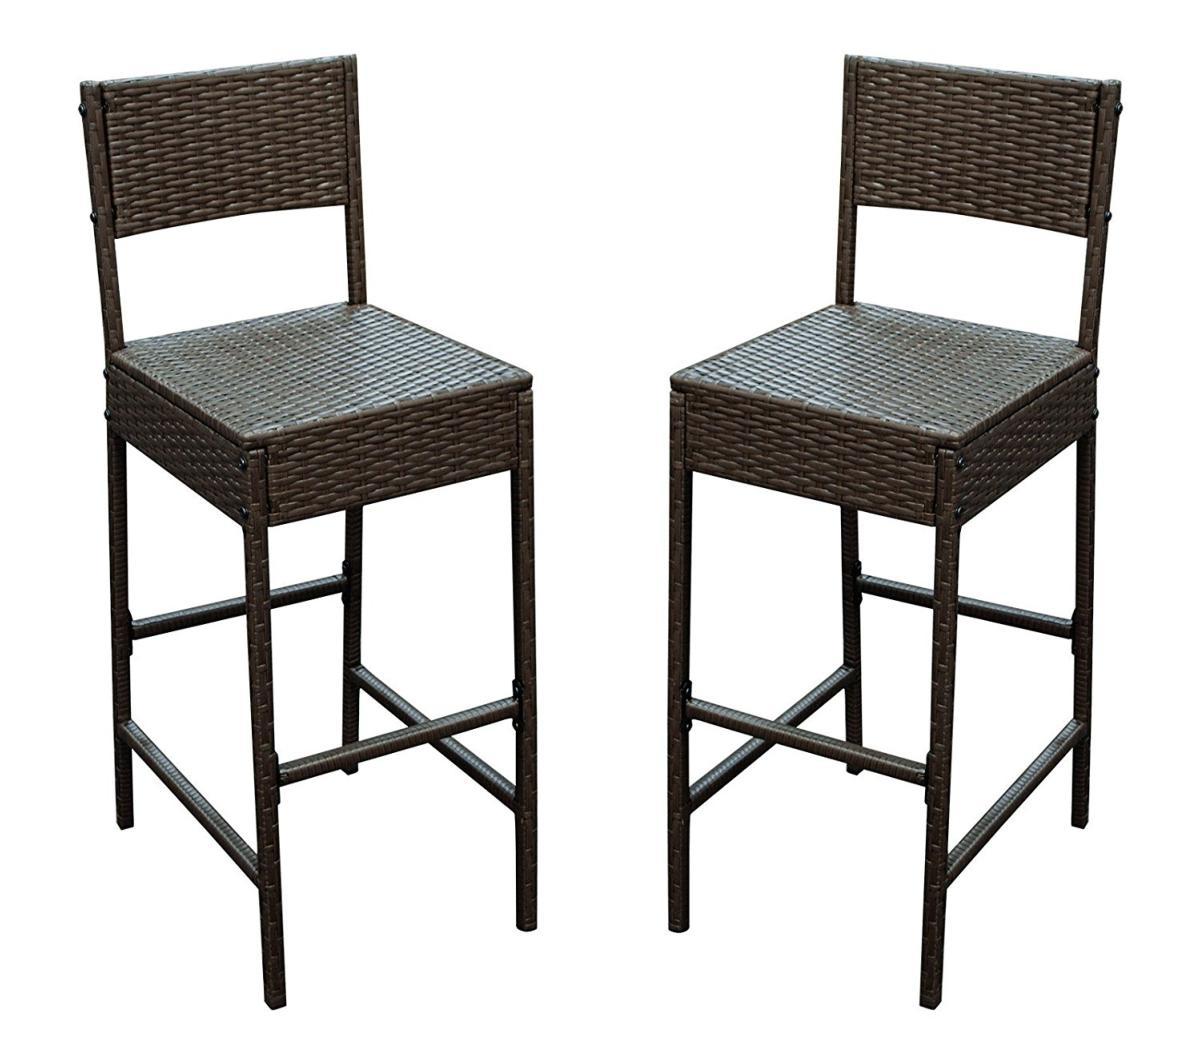 bar de jardin r sine tress e marron et acacia 6 fauteuils. Black Bedroom Furniture Sets. Home Design Ideas